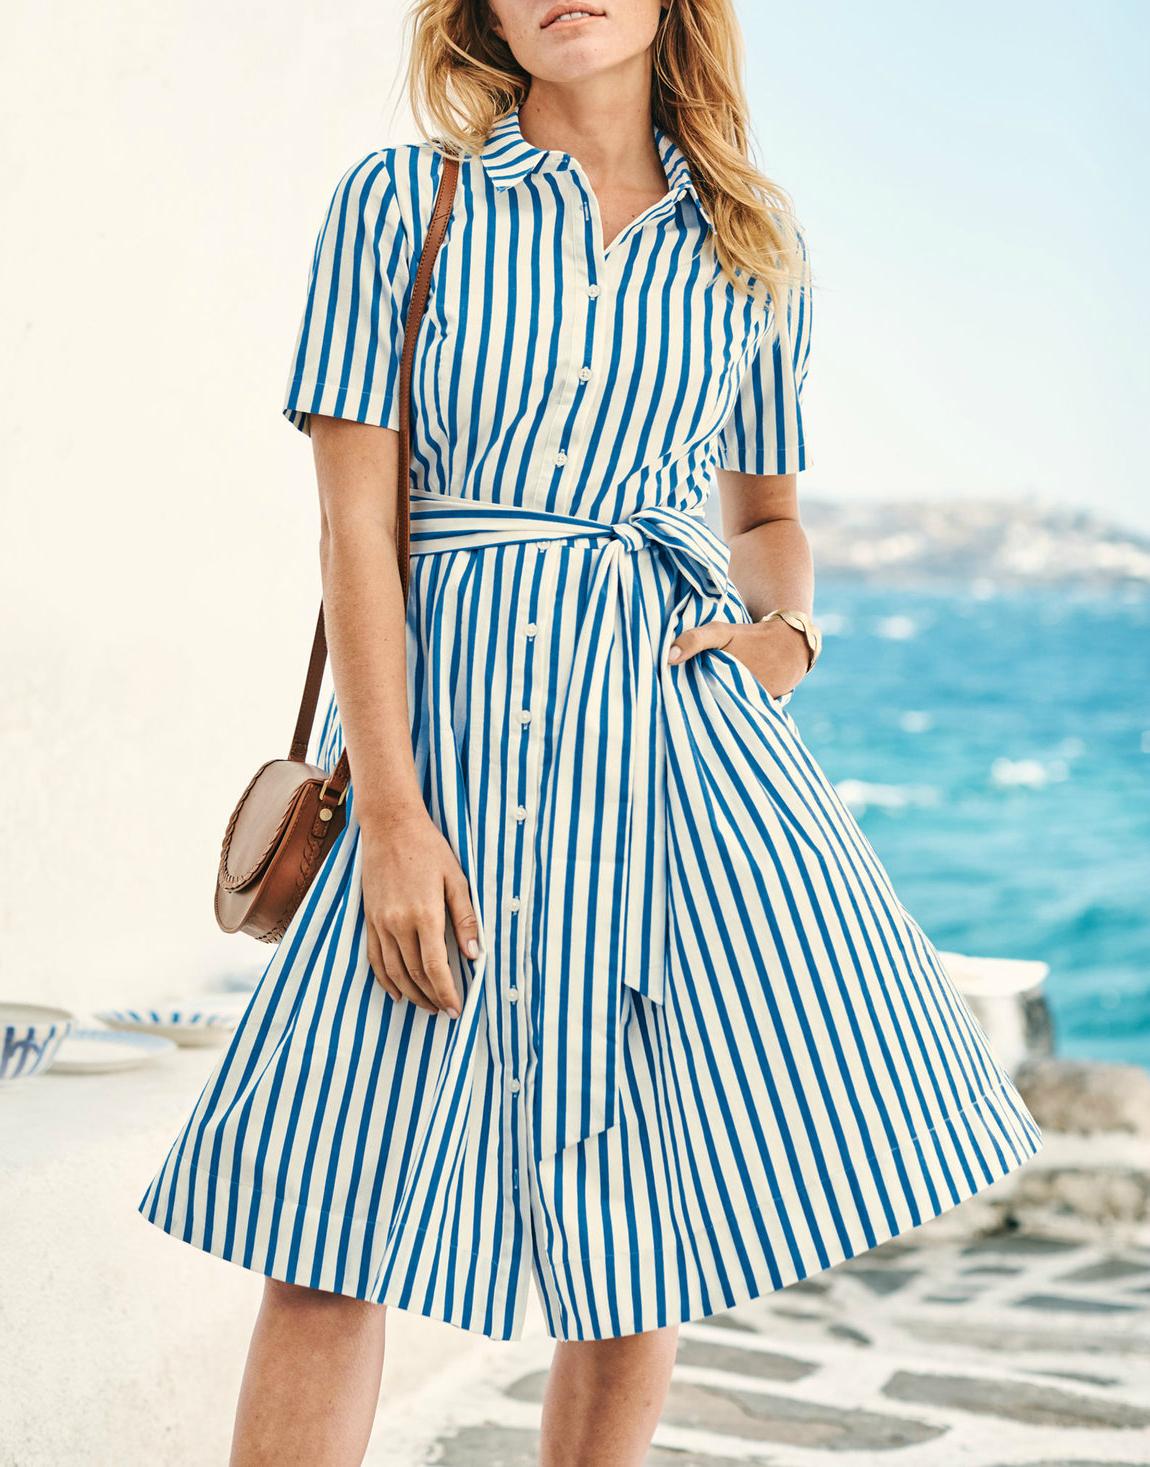 Cute Summer Dresses For Women That Travel